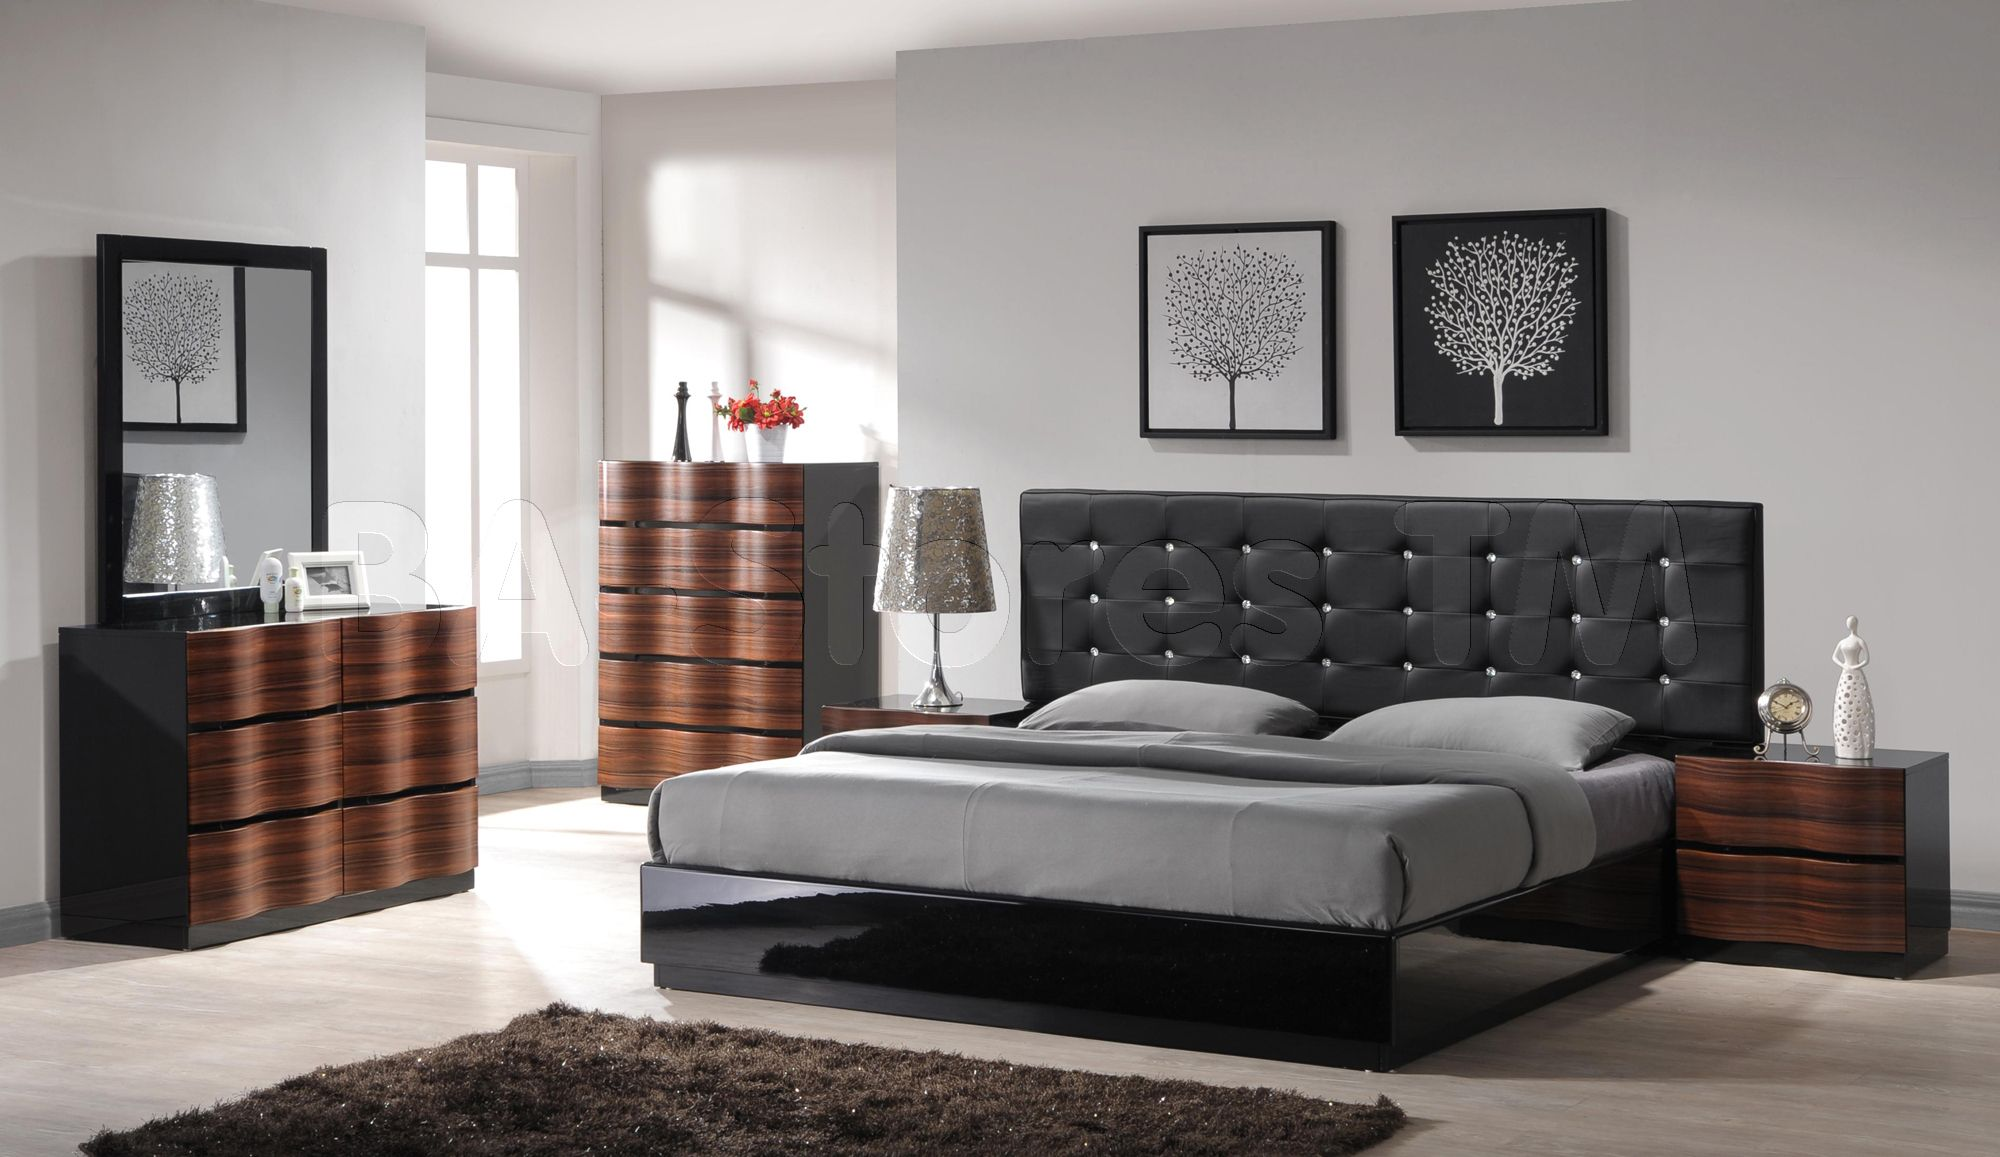 Boston Bedroom Set Platform Bedroom Sets Bedroom Interior Contemporary Bedroom Furniture